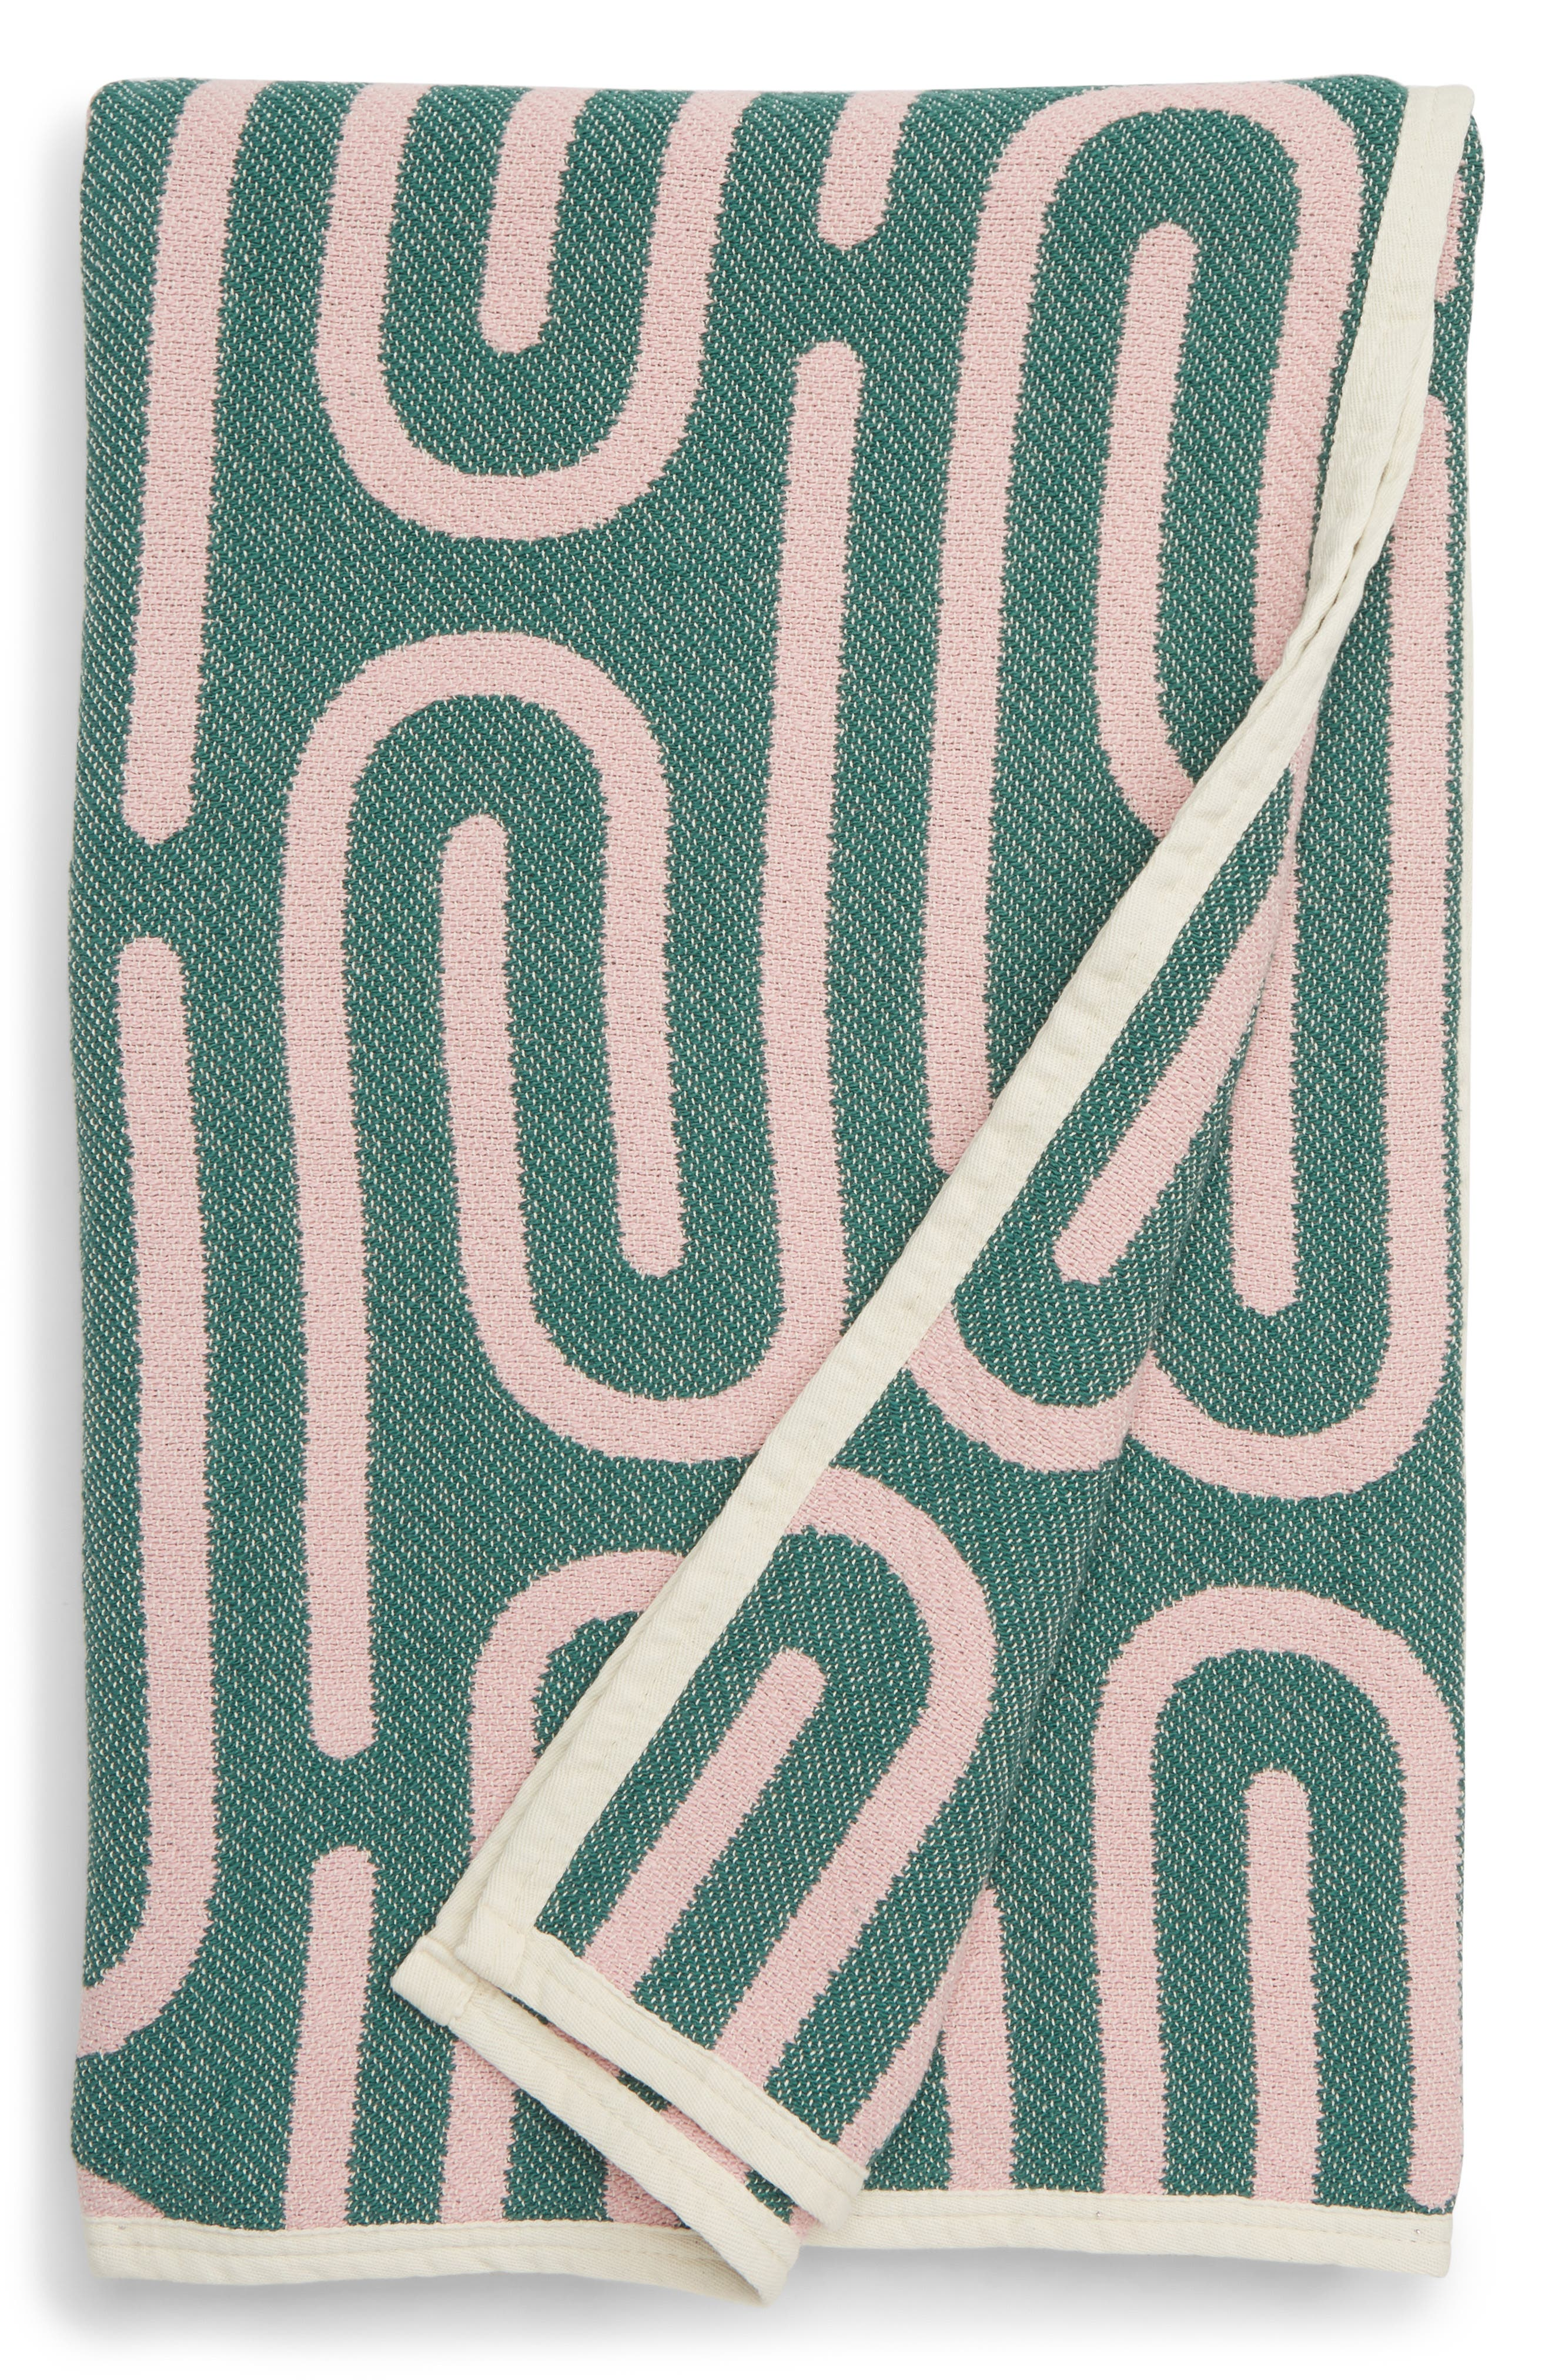 DUSEN DUSEN Clip Throw Blanket, Main, color, 100